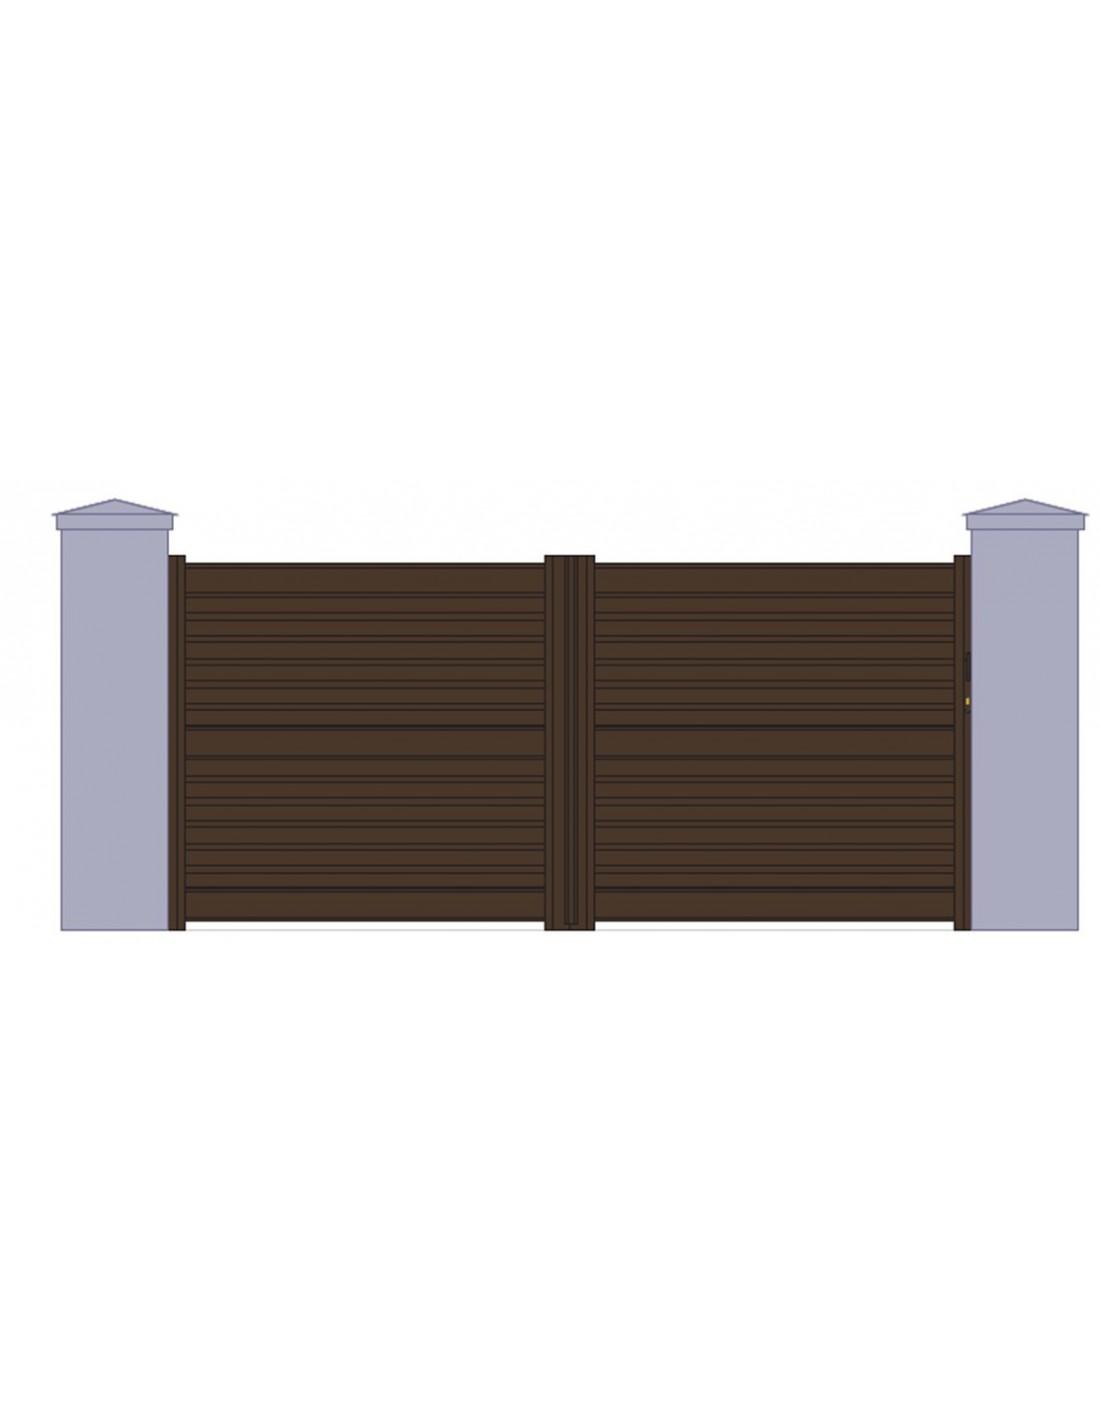 portail aluminium coulissant persienn l 3m00 5m00. Black Bedroom Furniture Sets. Home Design Ideas